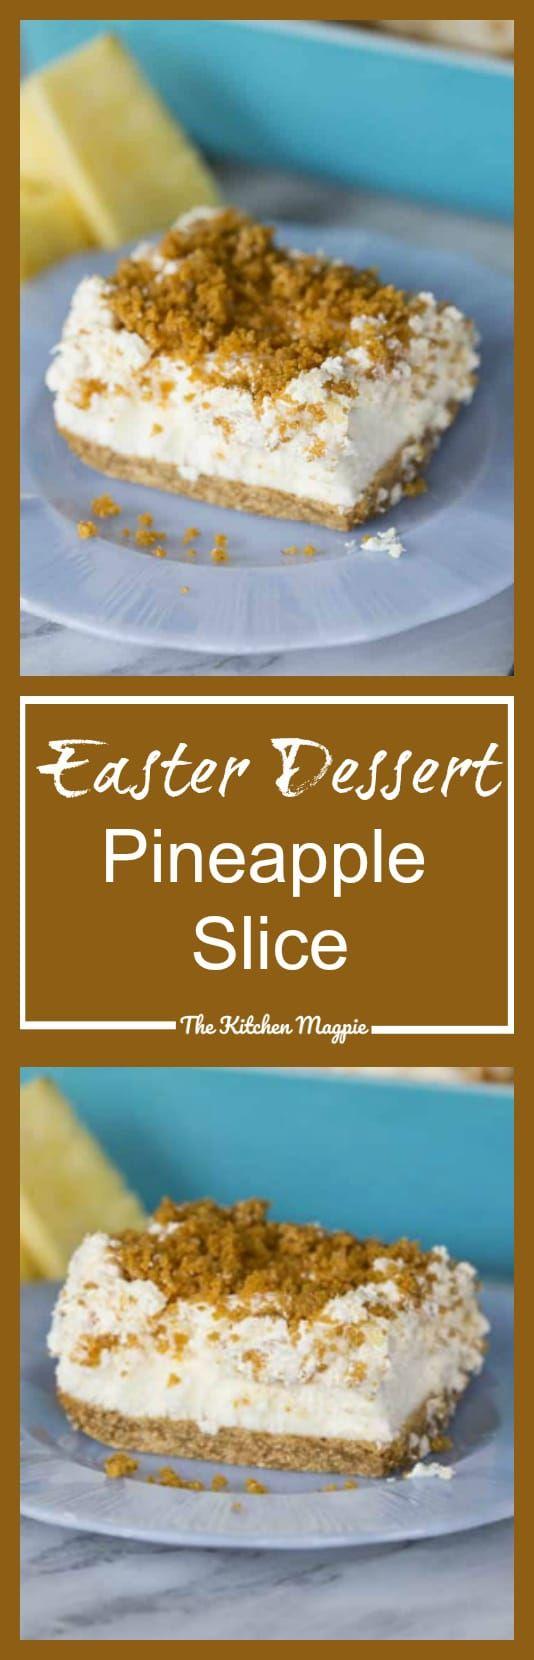 Easter Dessert : Pineapple Slice - The Kitchen Magpie